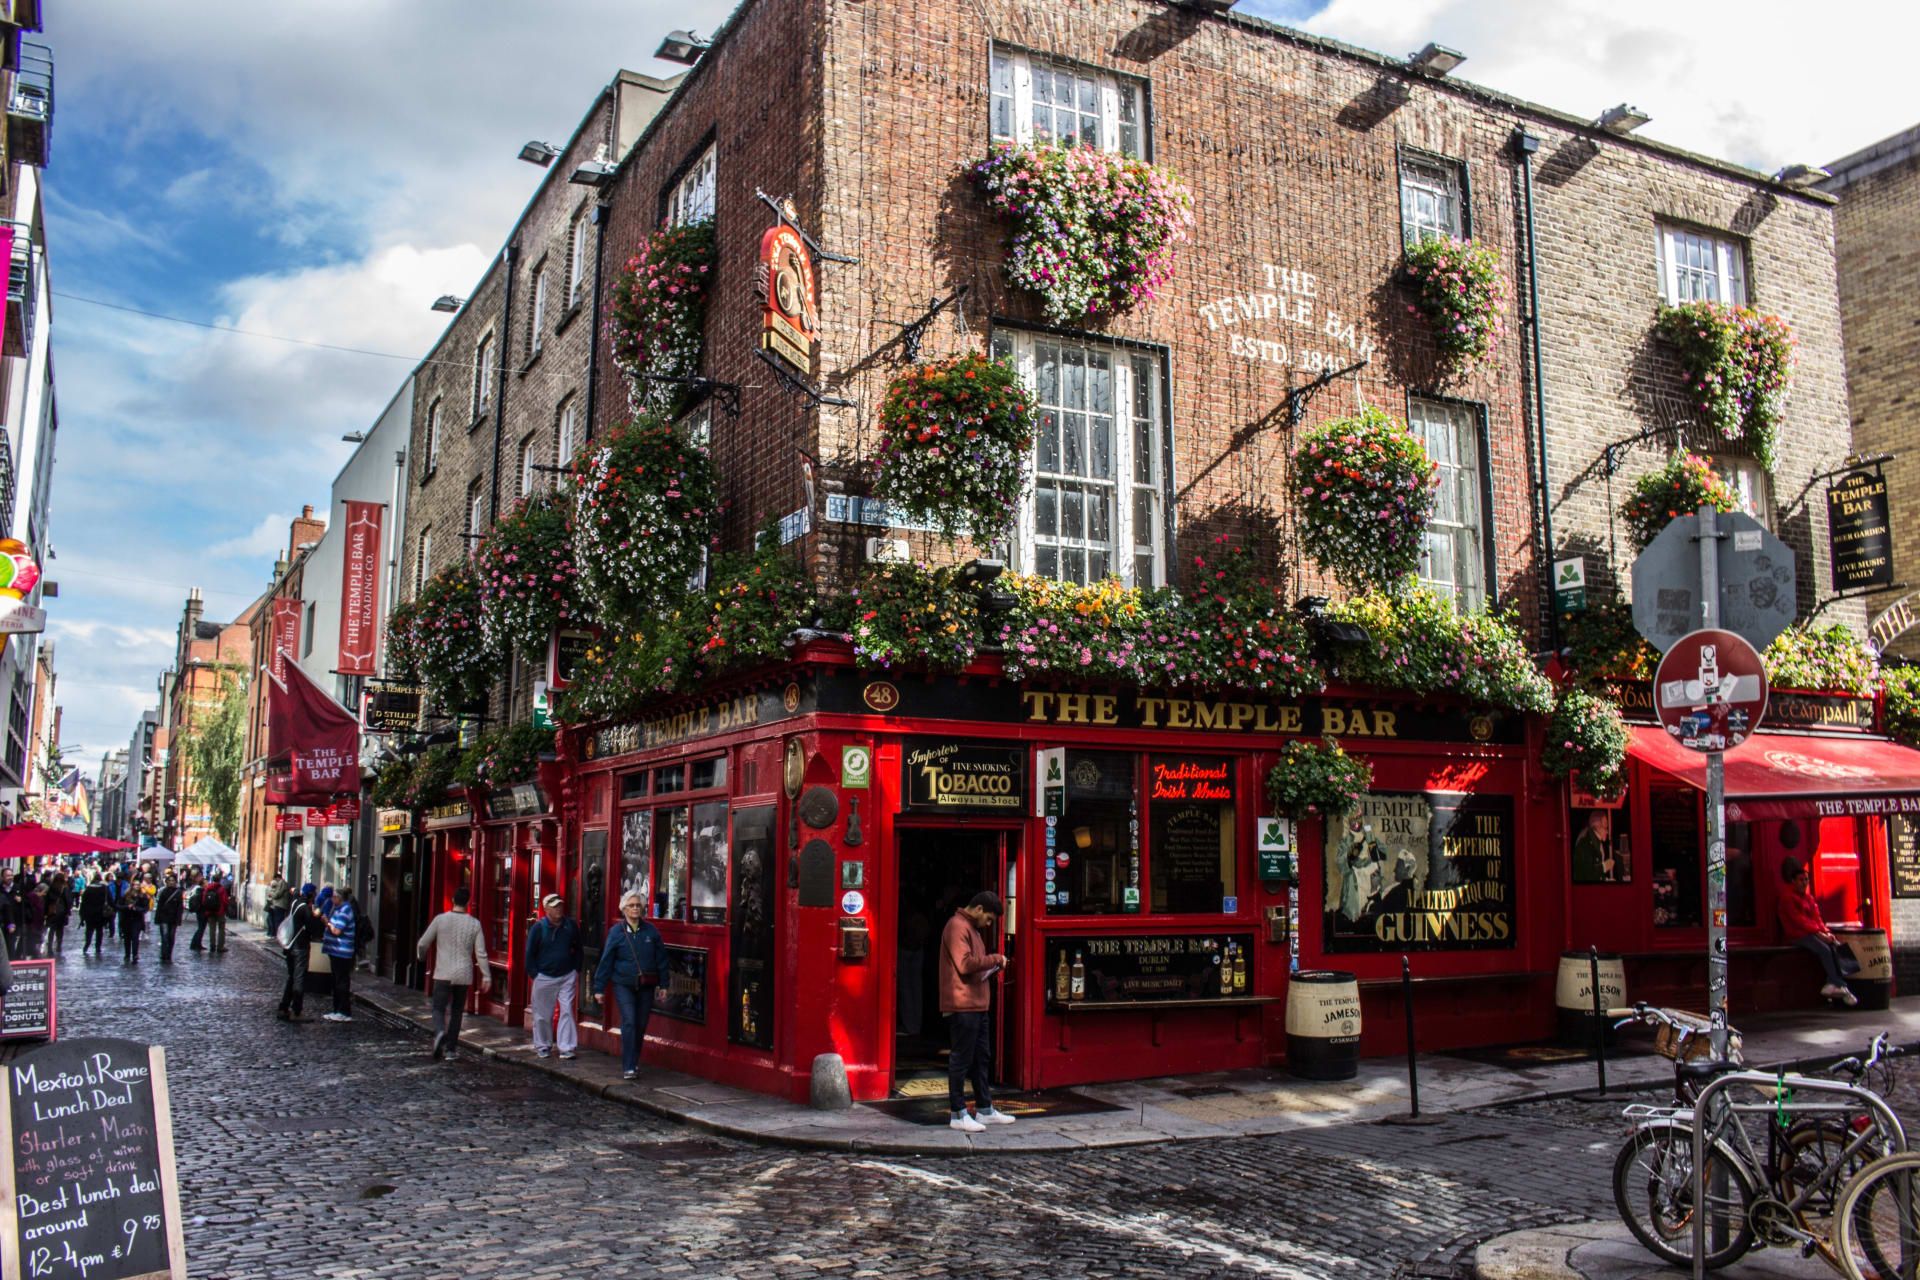 Dublin - Tales from Temple Bar